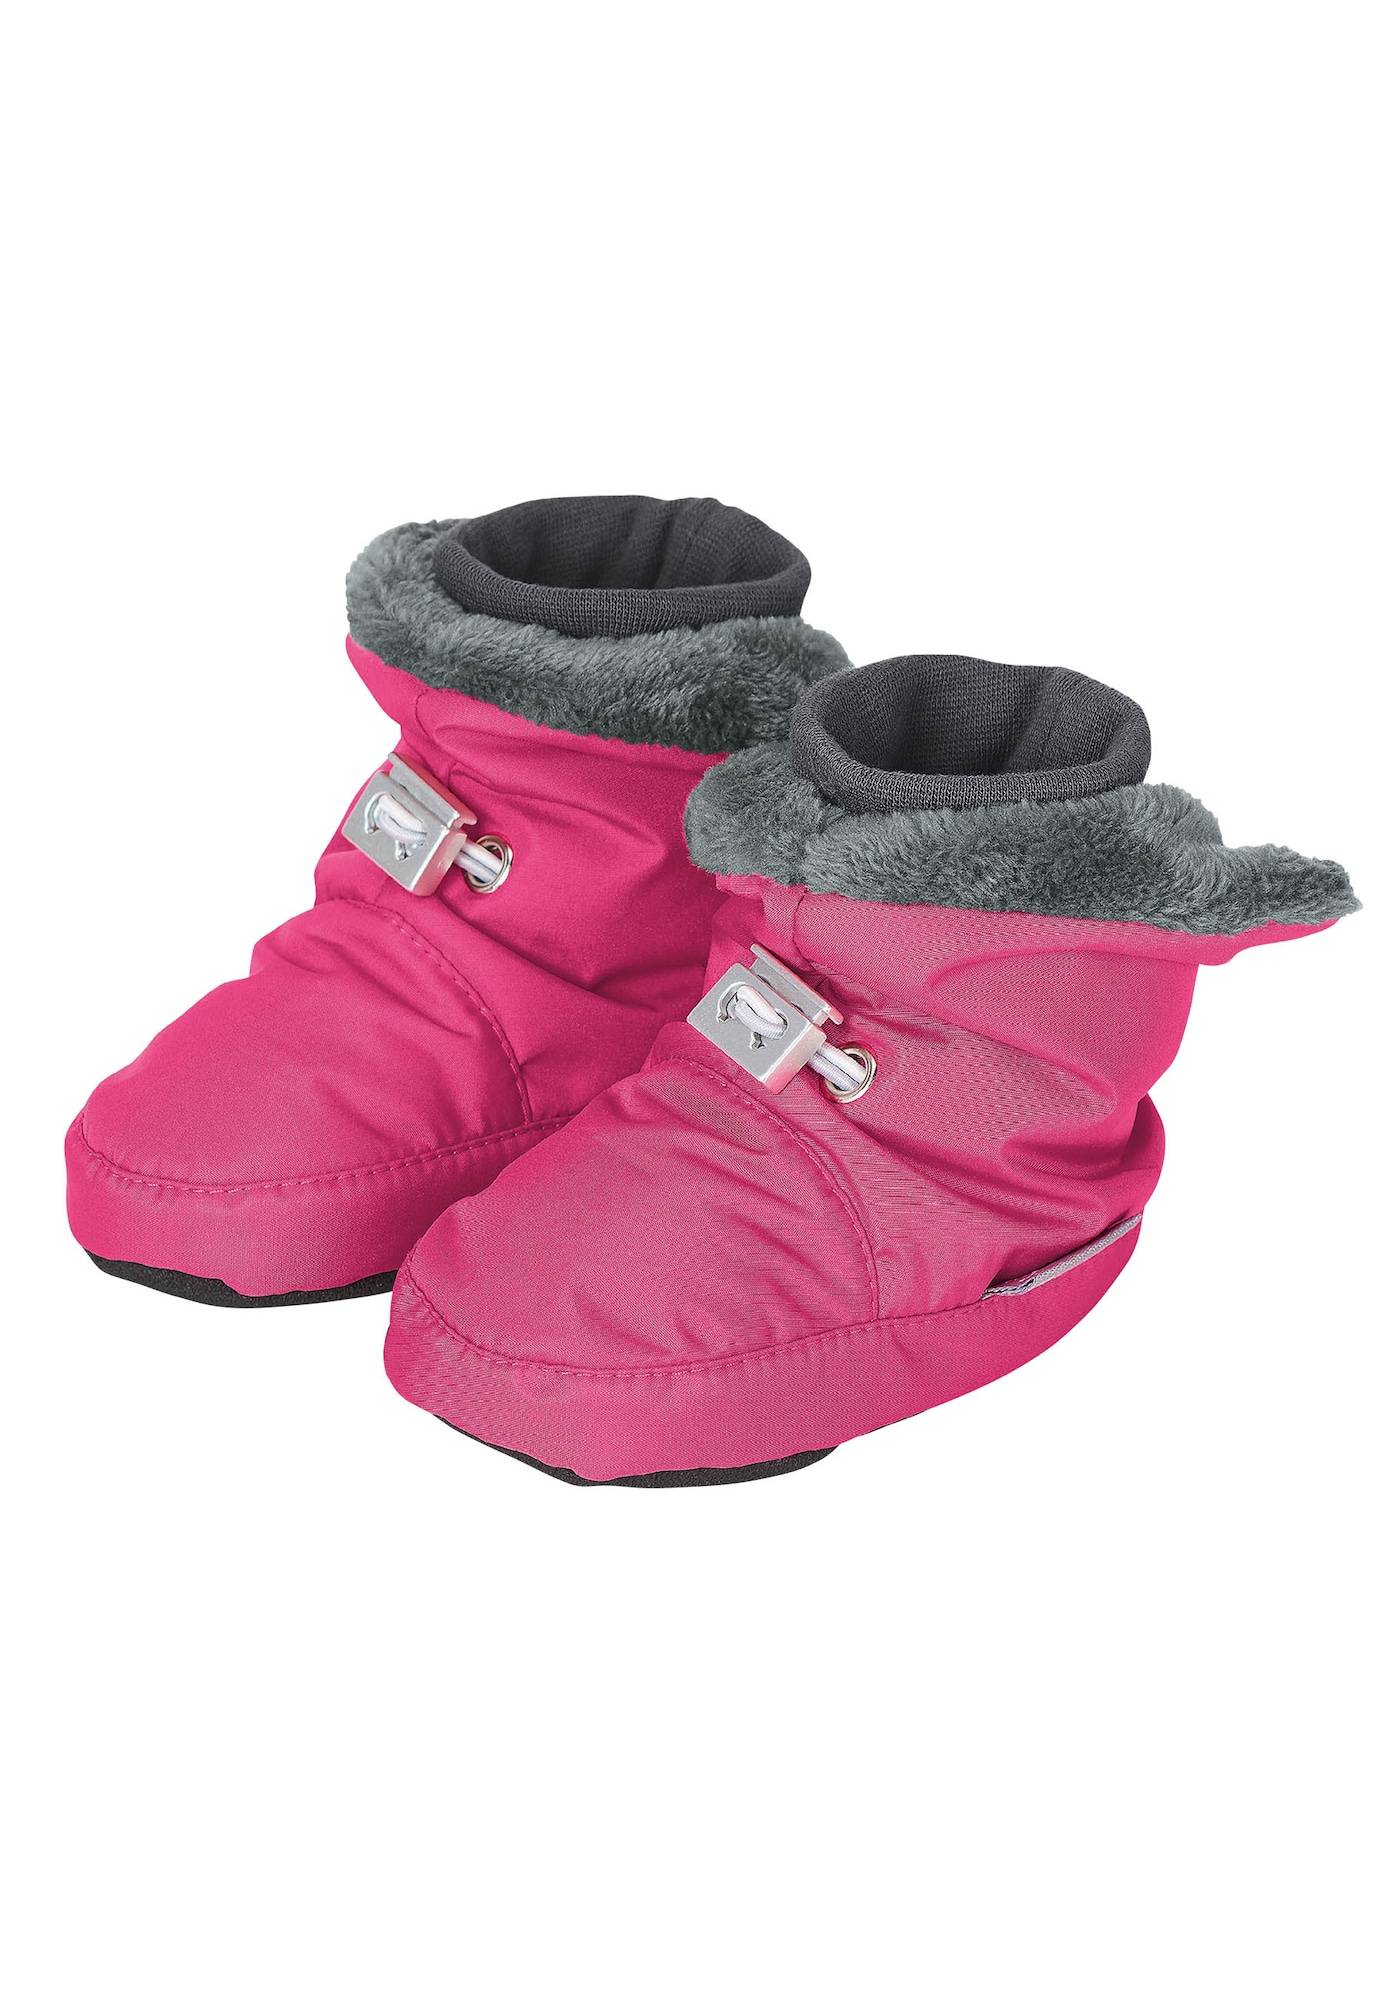 STERNTALER Bottes de neige  - Rose - Taille: 16 - kids